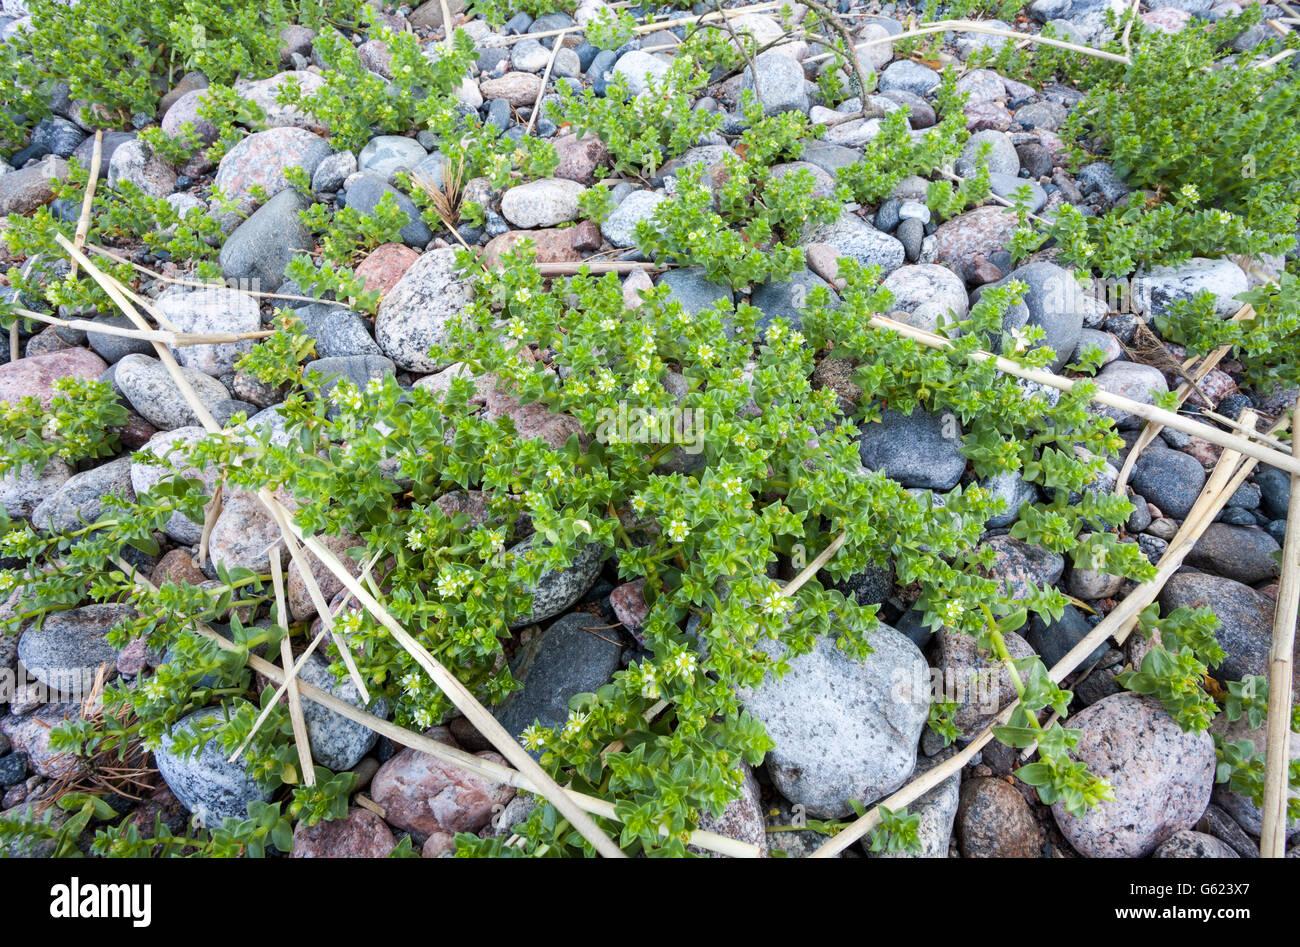 Sea sandwort (Honckenya peploides) - Stock Image